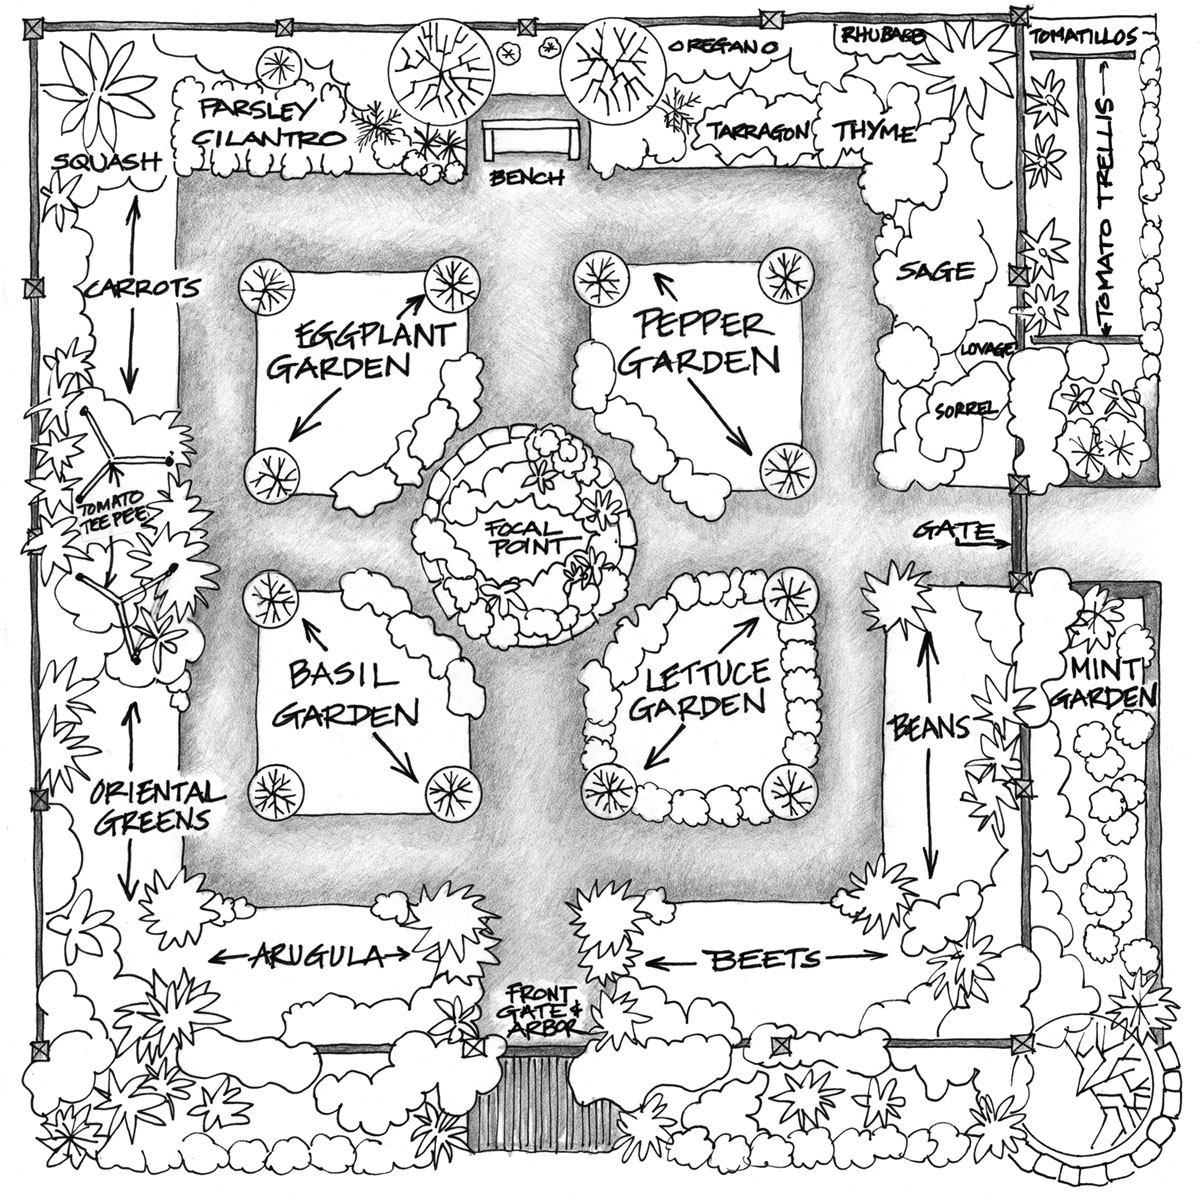 Permaculture Garden Design residential plan Permaculture Vegetable Garden Design Qzys